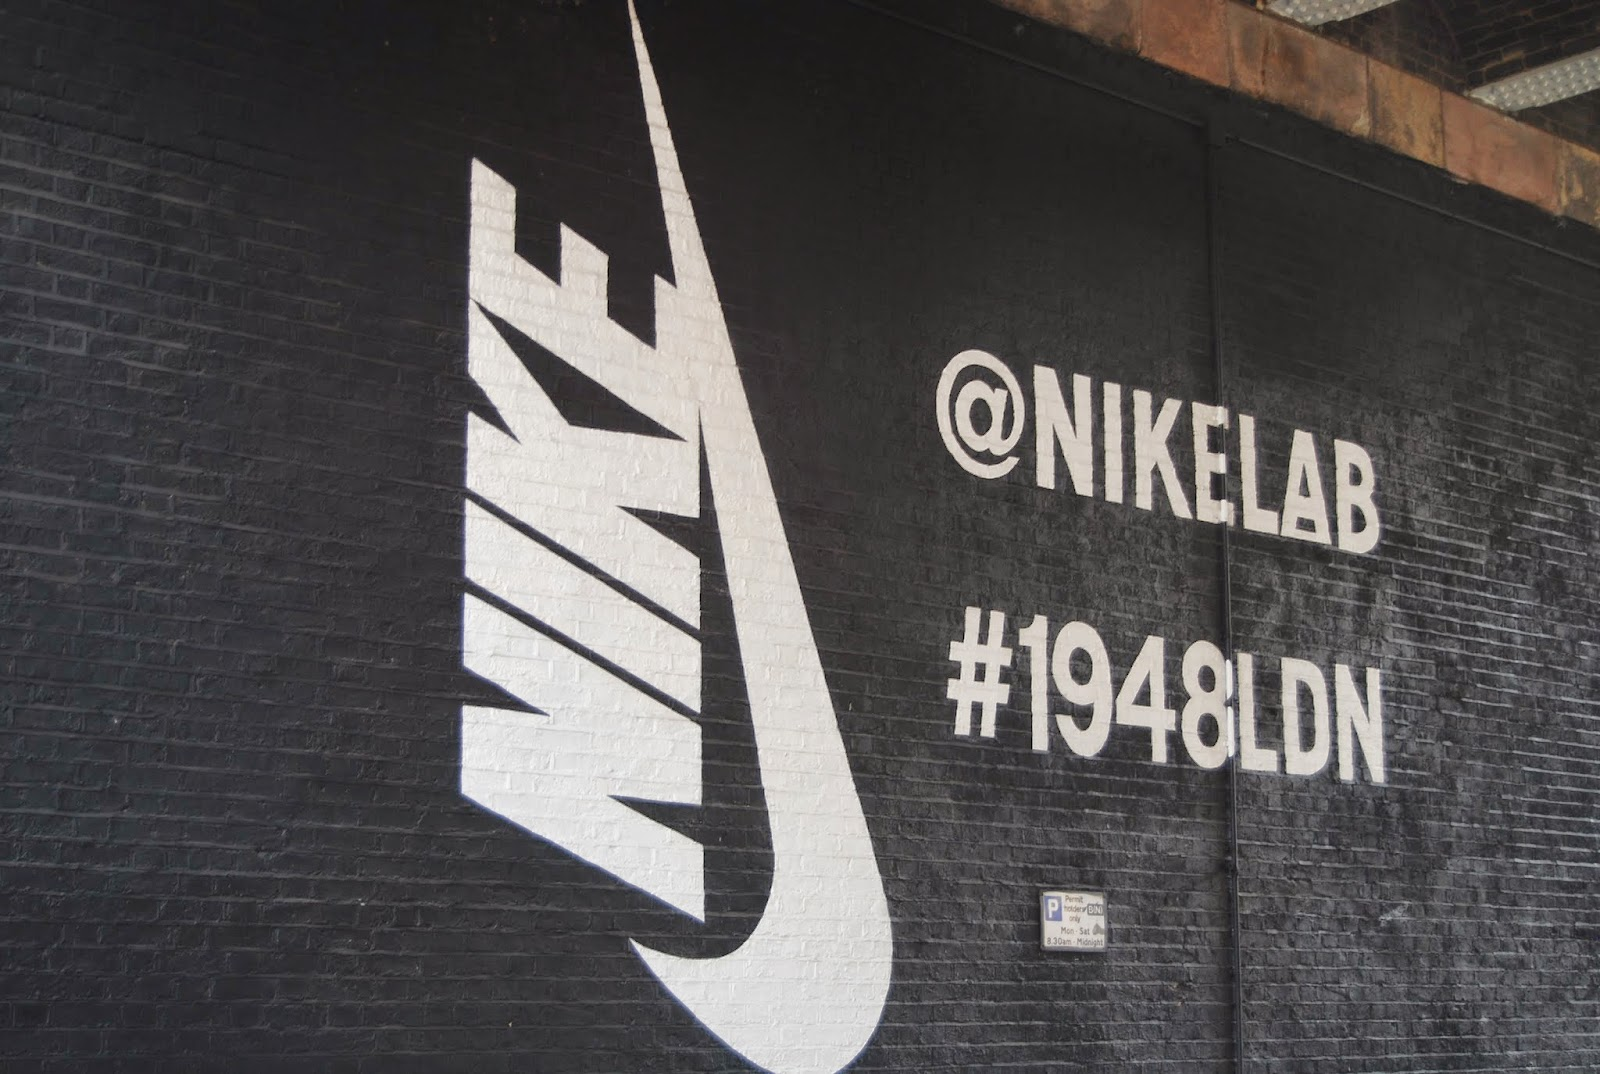 Simply Elemental Fashion  And so...  NikeLab 1948 LDN Shoreditch ... ee70c35807